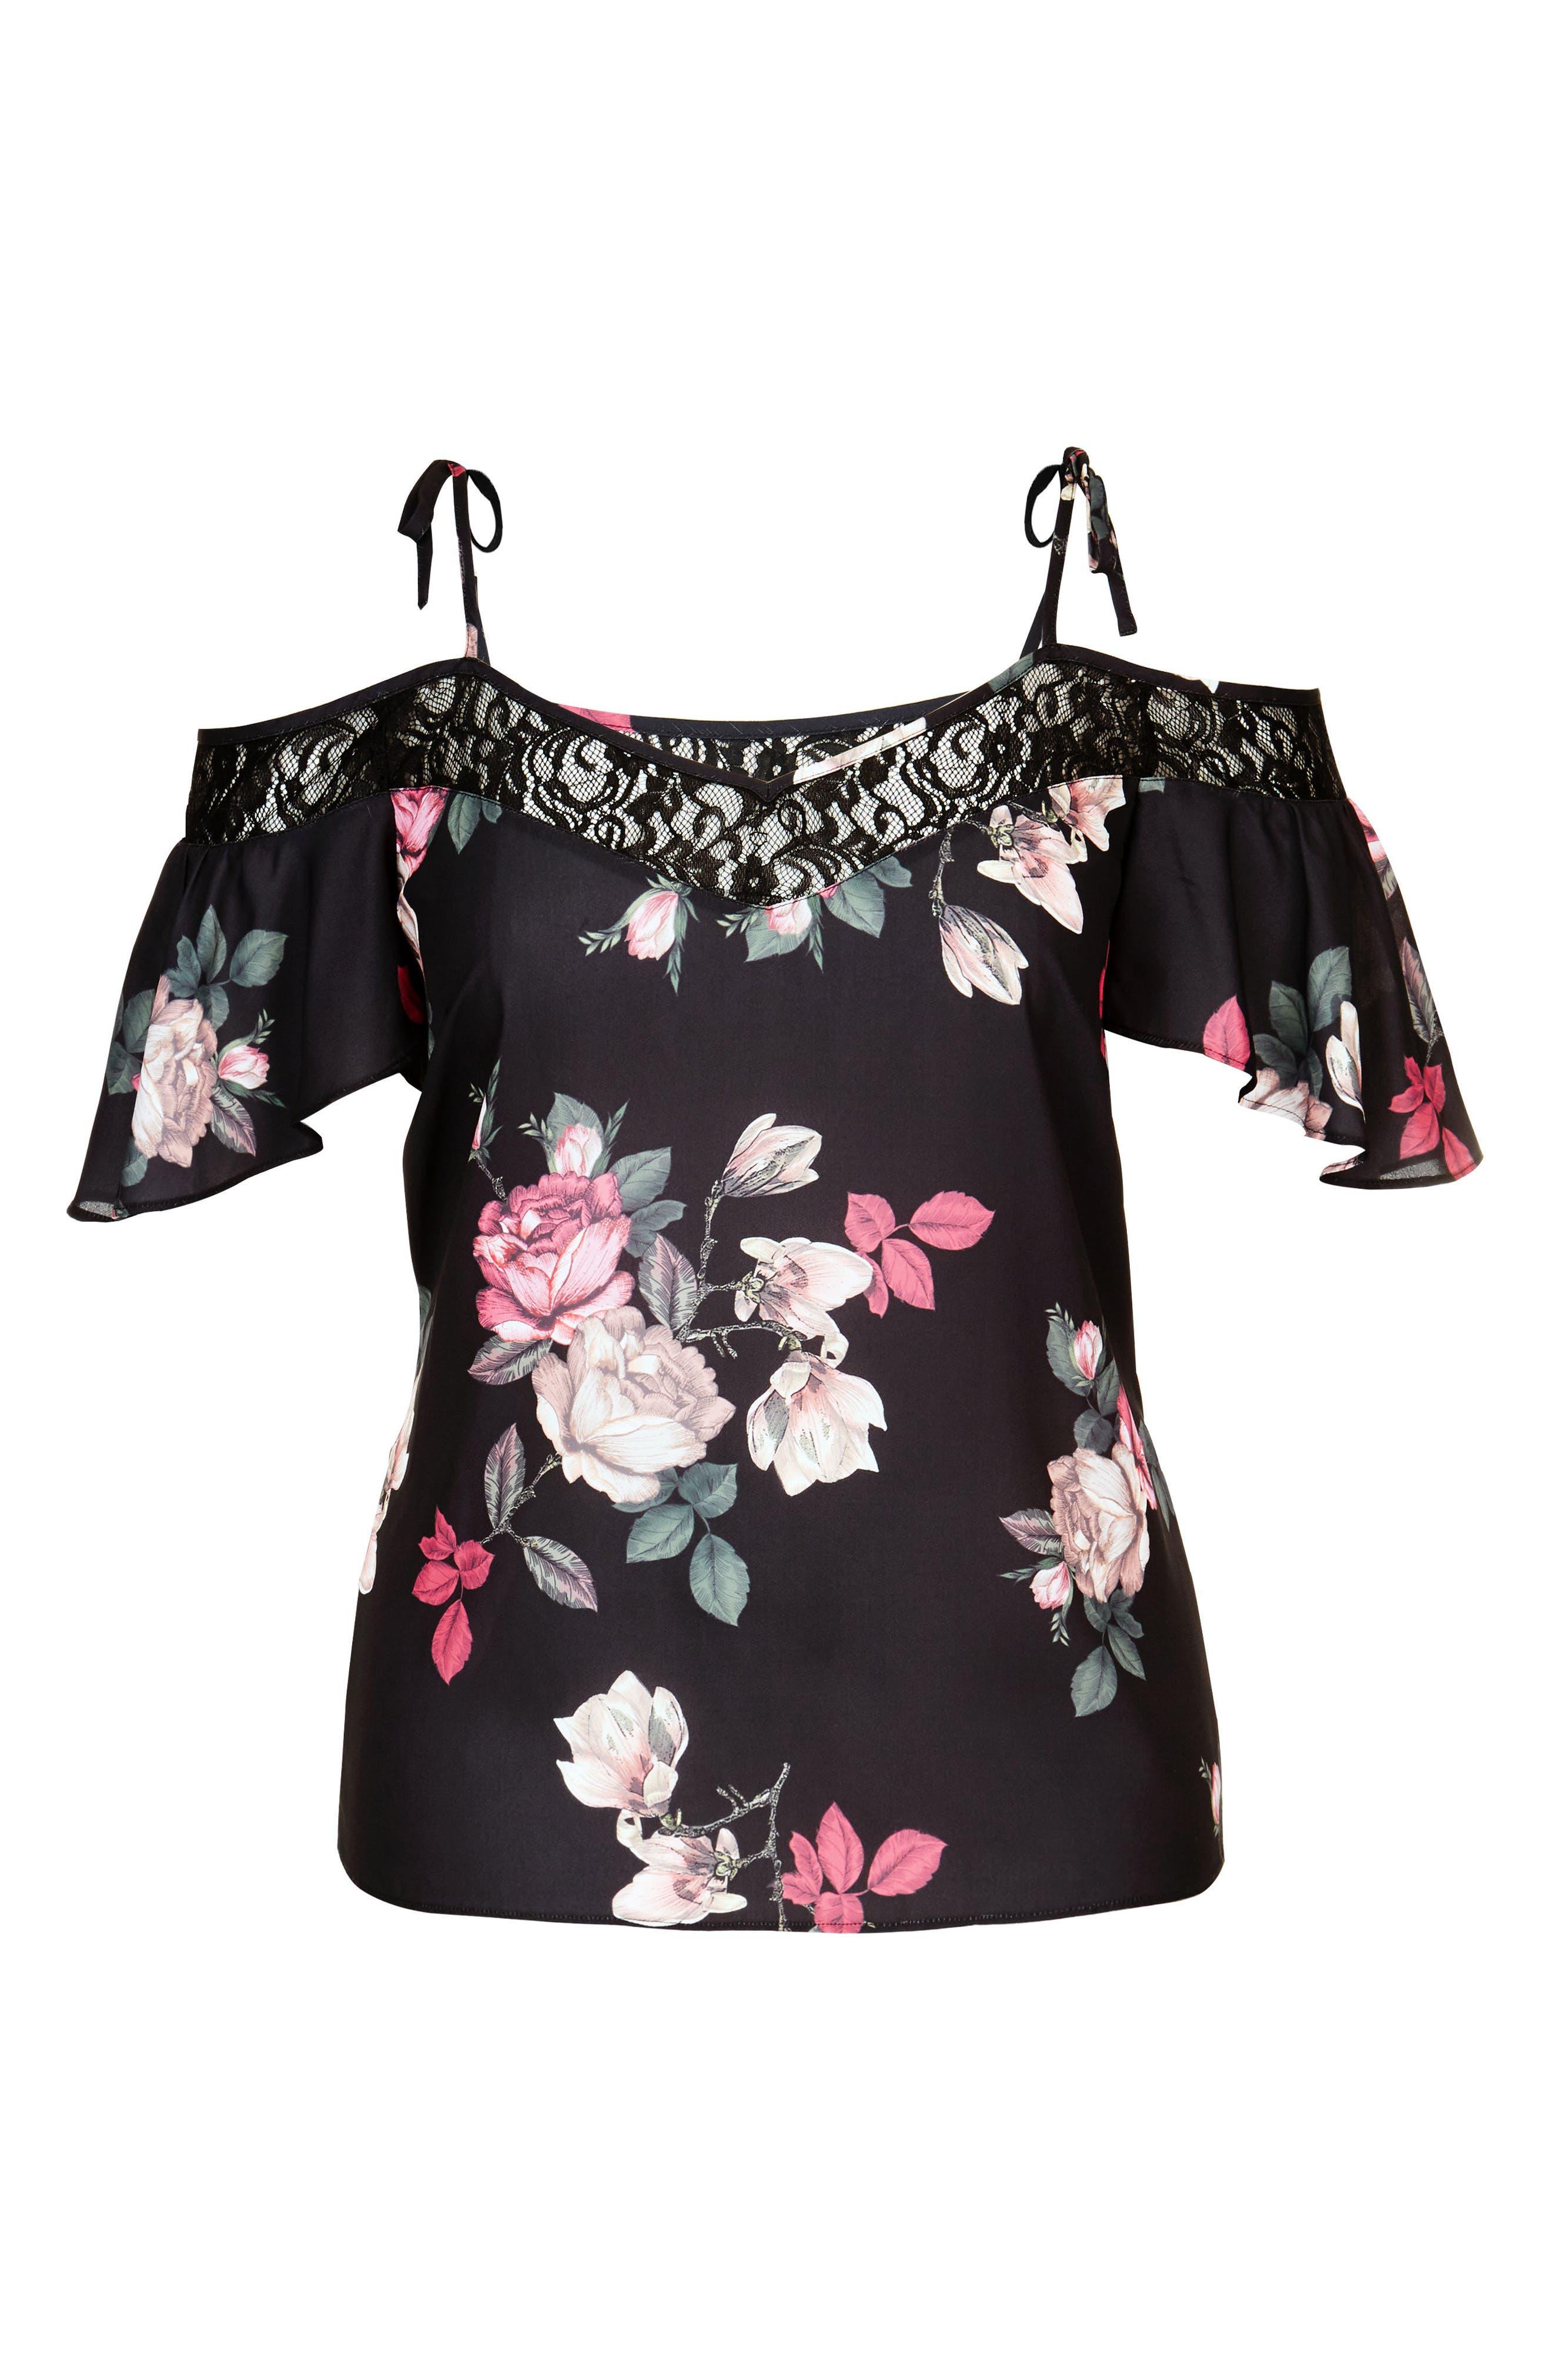 Lace Trim Floral Off the Shoulder Top,                             Alternate thumbnail 3, color,                             Mirror Rose